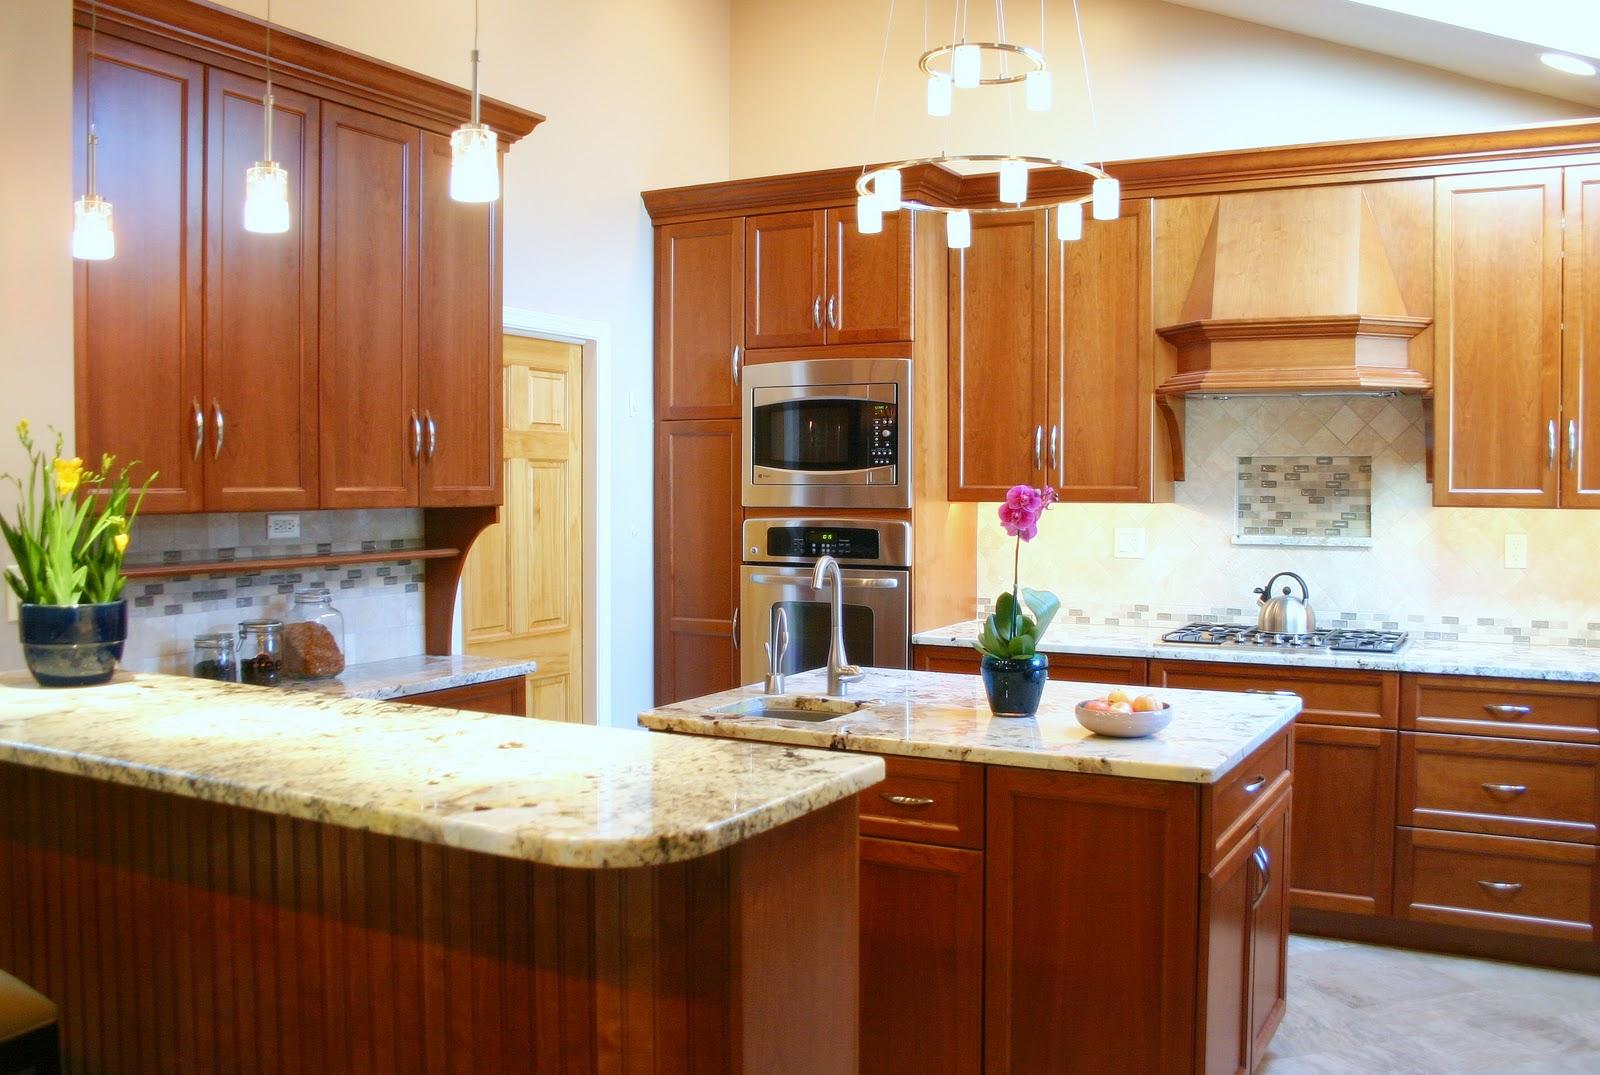 Kitchen Lighting Ideas Vaulted Ceiling Kitchen Lighting Home Design